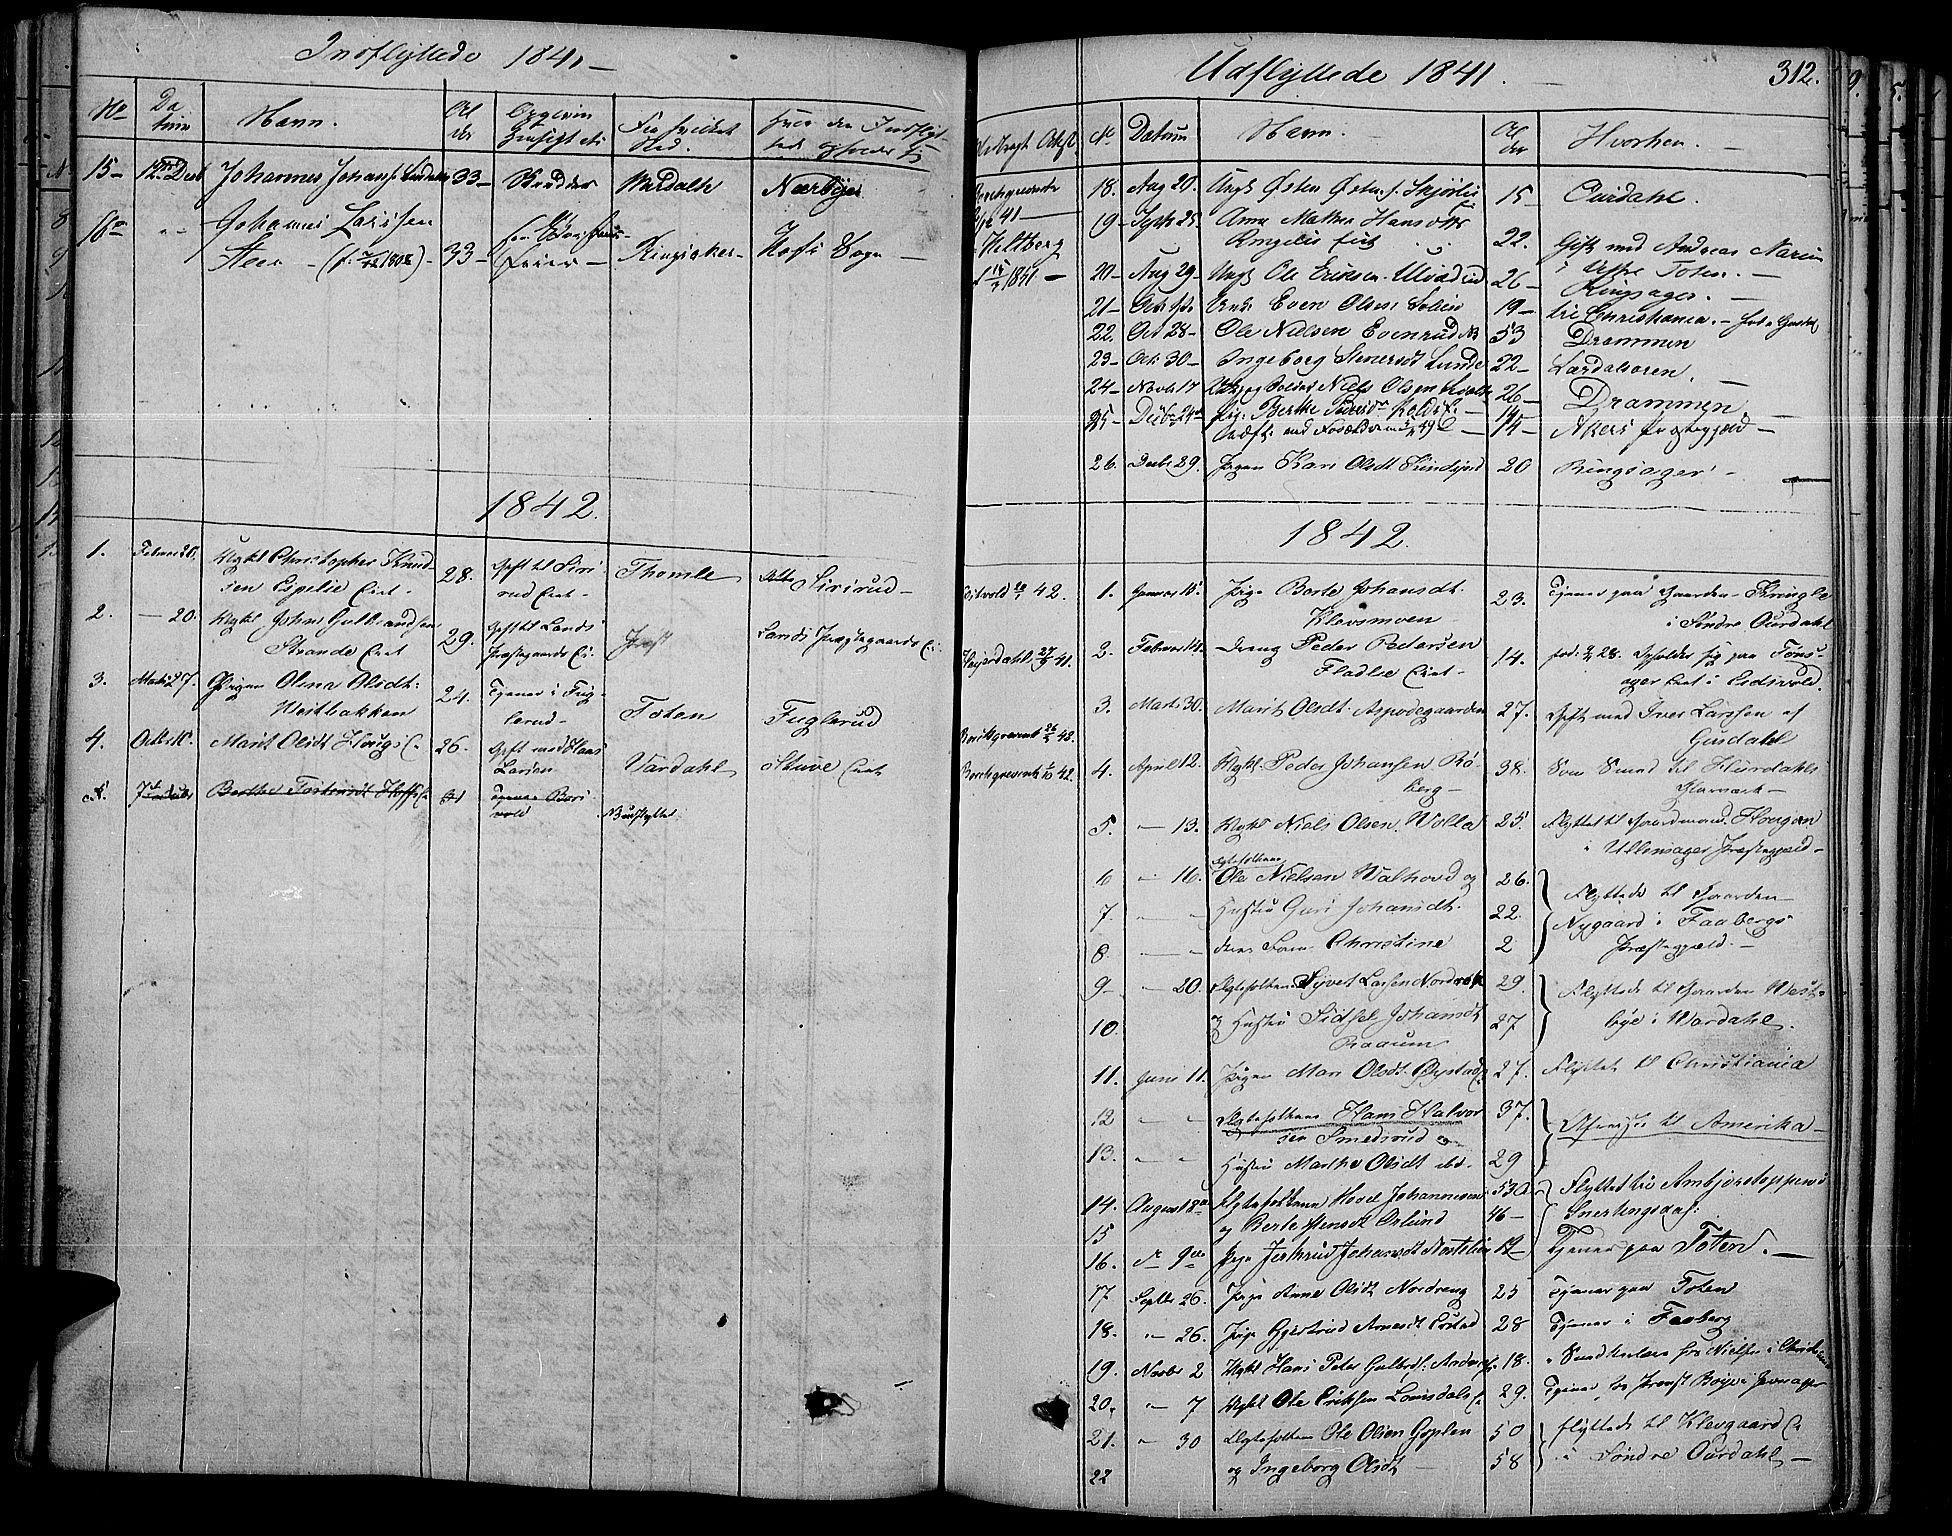 SAH, Land prestekontor, Ministerialbok nr. 8, 1830-1846, s. 312